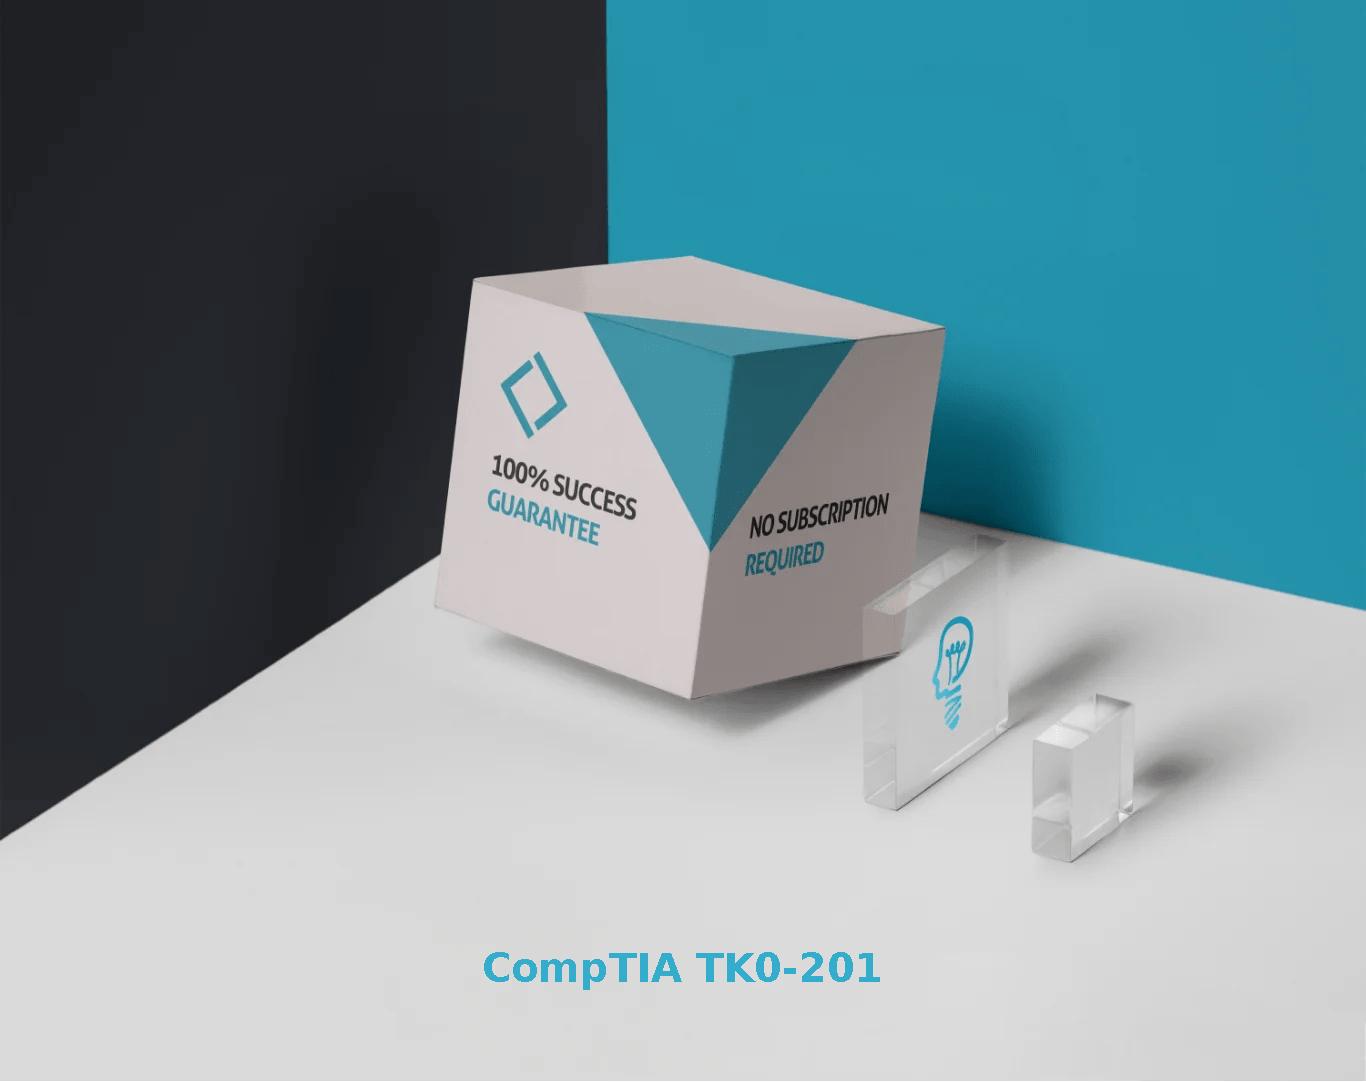 CompTIA TK0-201 Exams